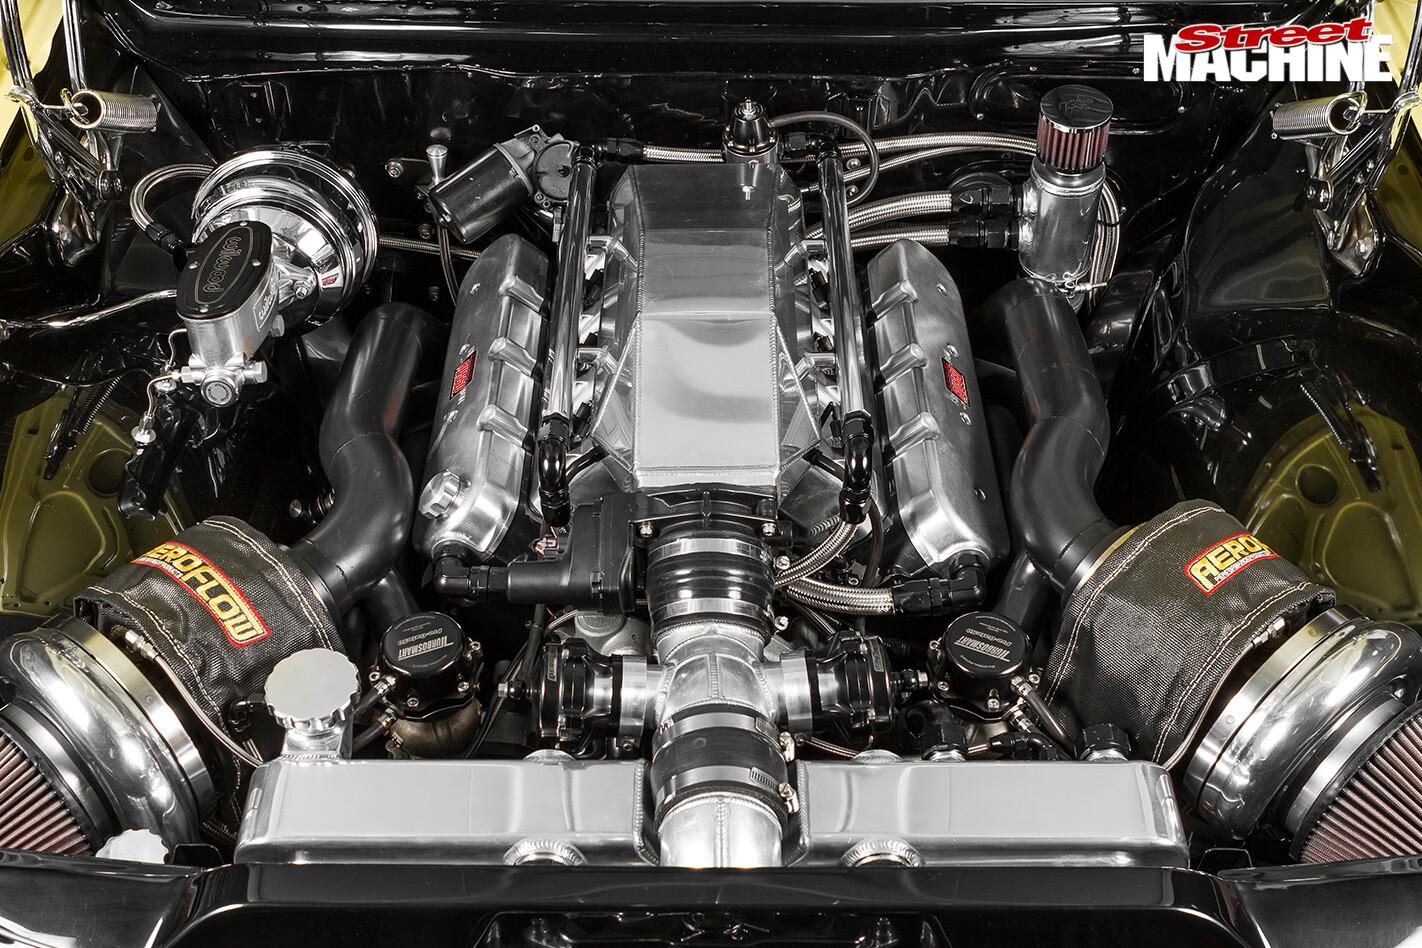 Holden -hk -monaro -engine -bay